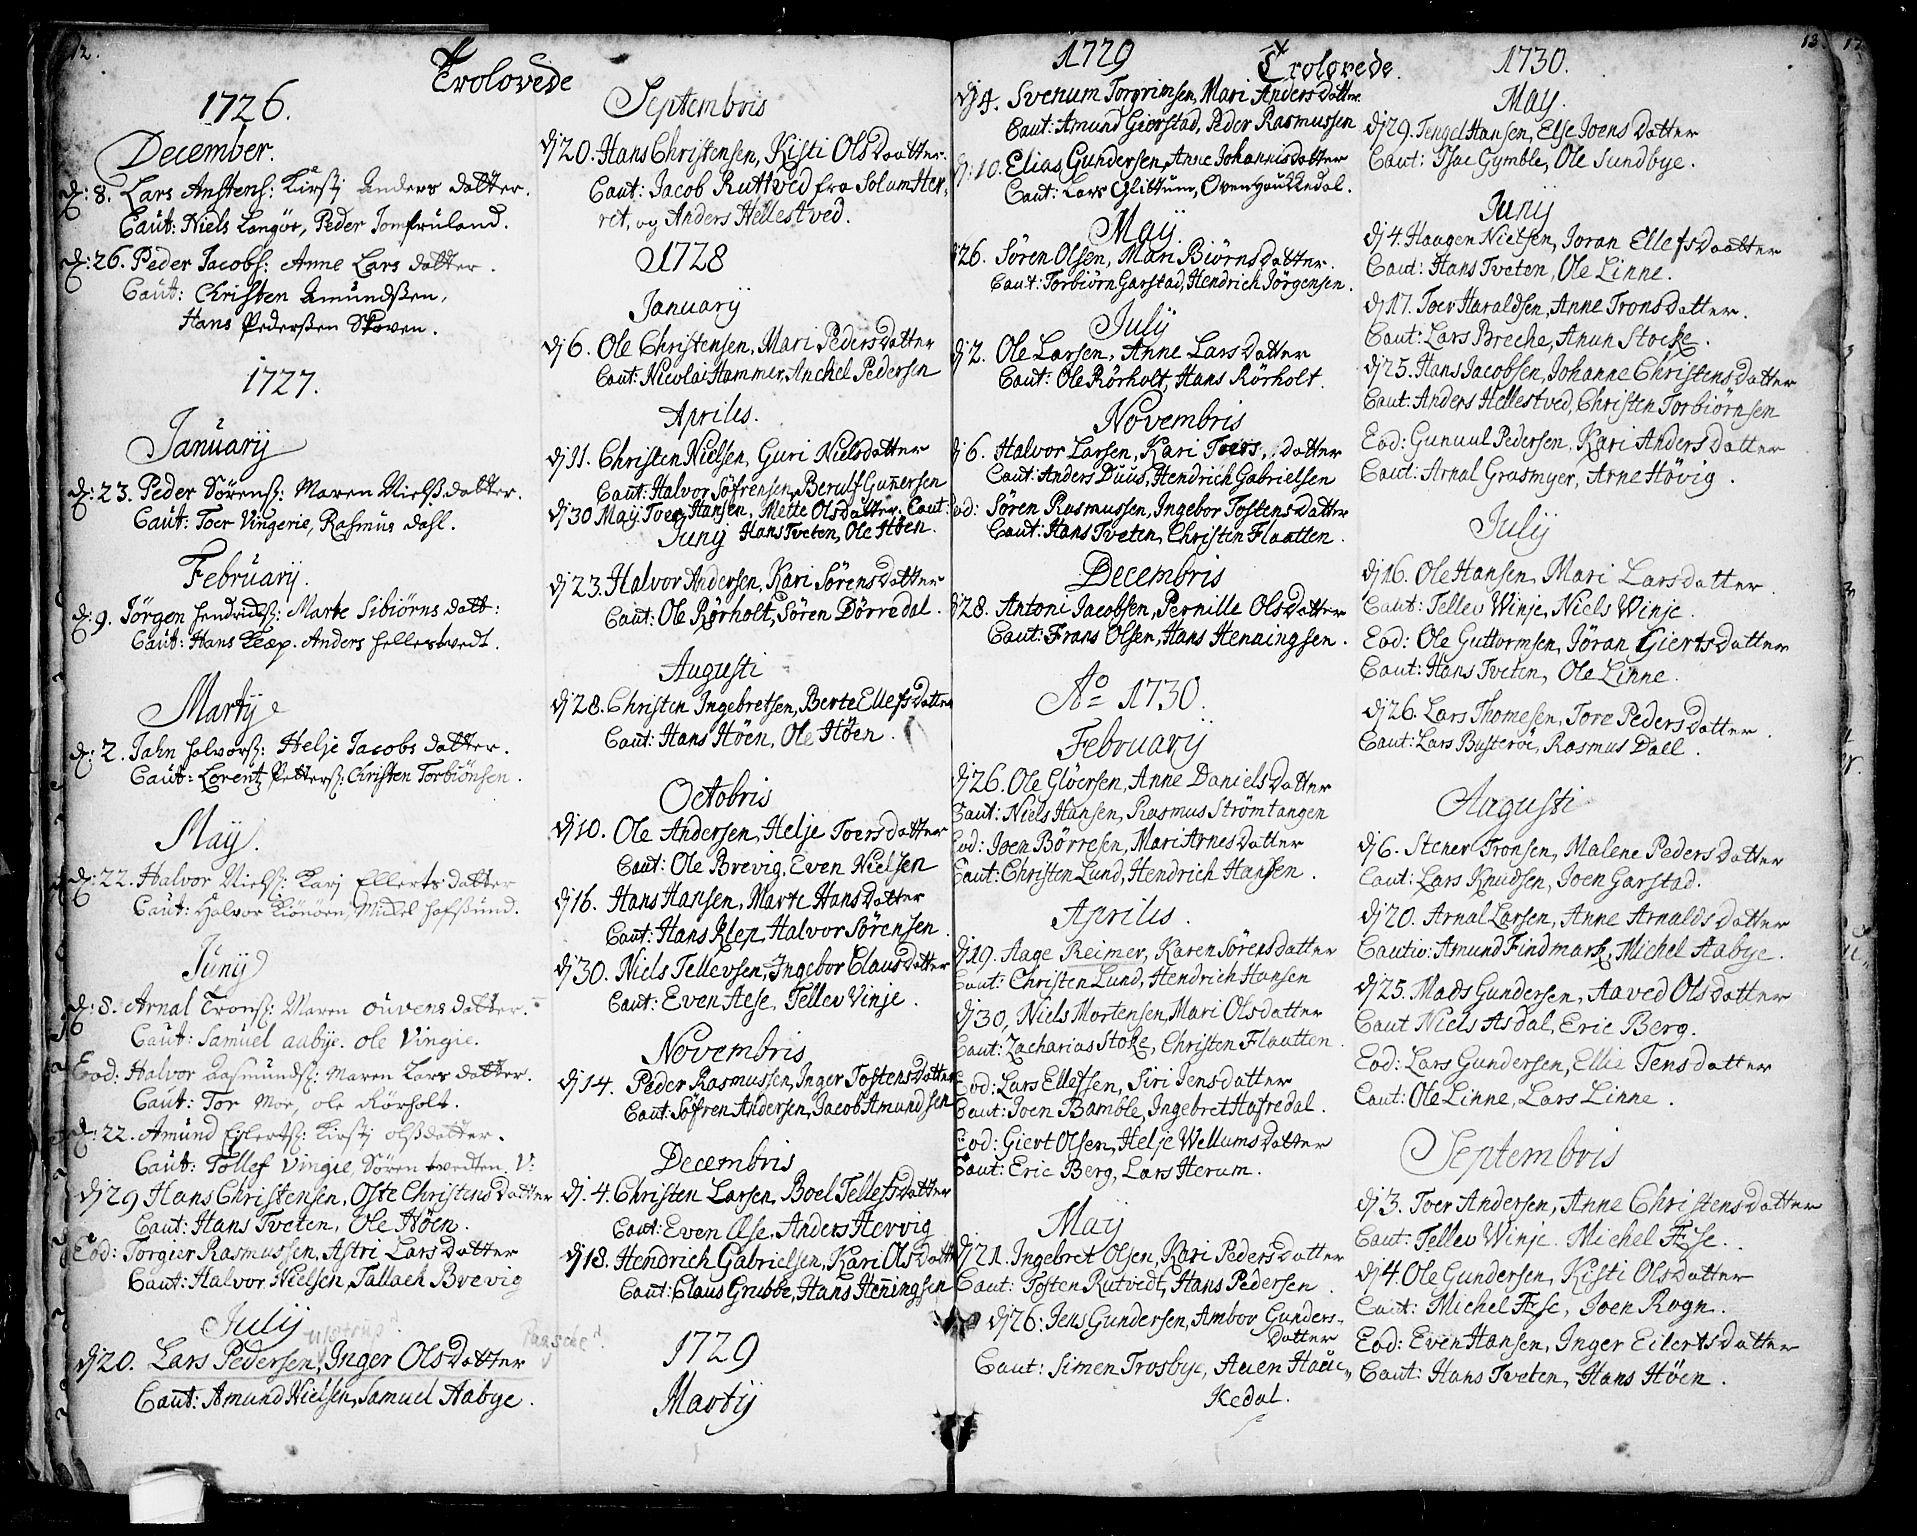 SAKO, Bamble kirkebøker, F/Fa/L0001: Ministerialbok nr. I 1, 1702-1774, s. 12-13